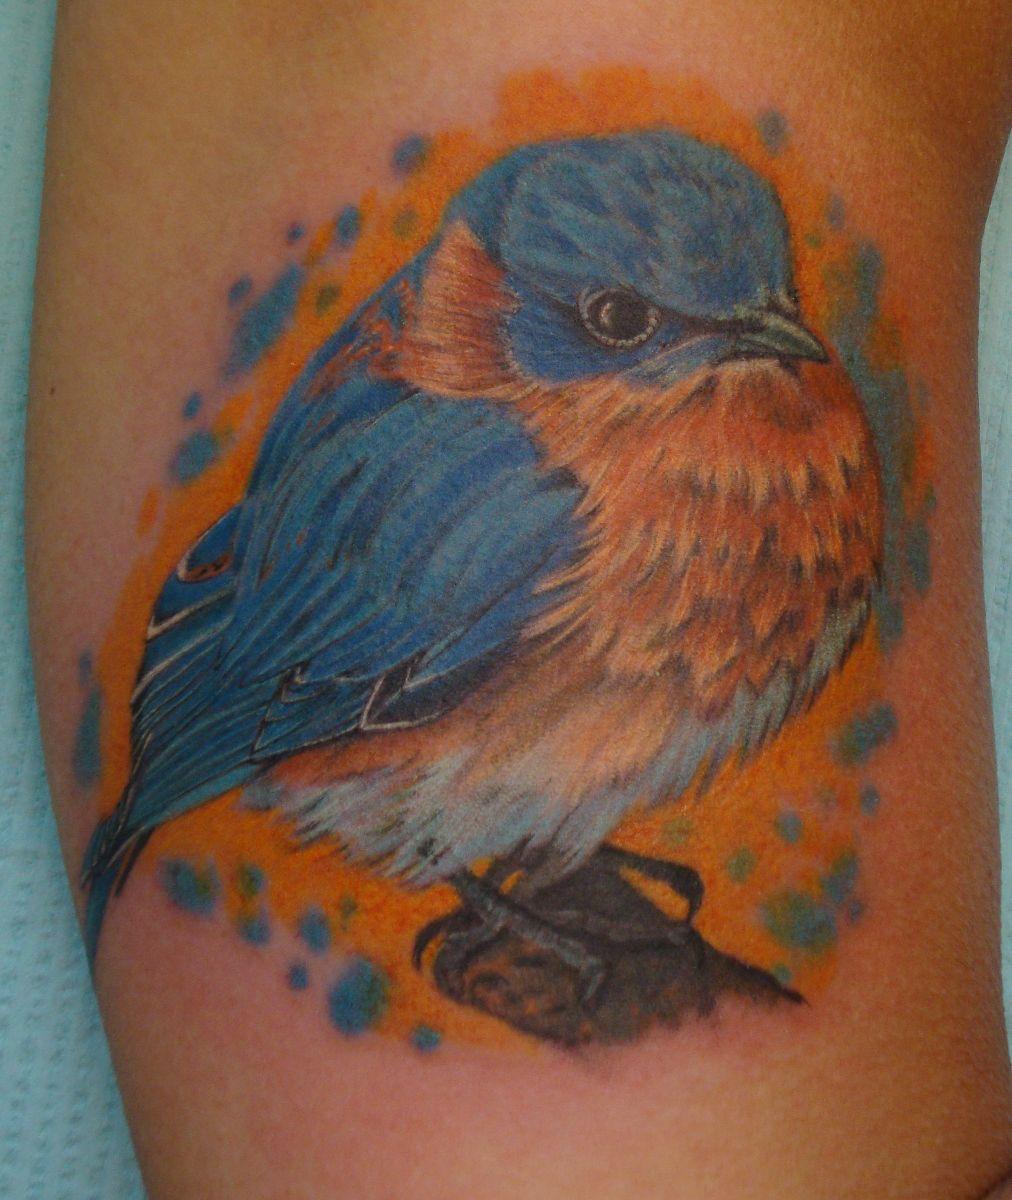 Eastern Bluebird Tattoo by Larry Brogan